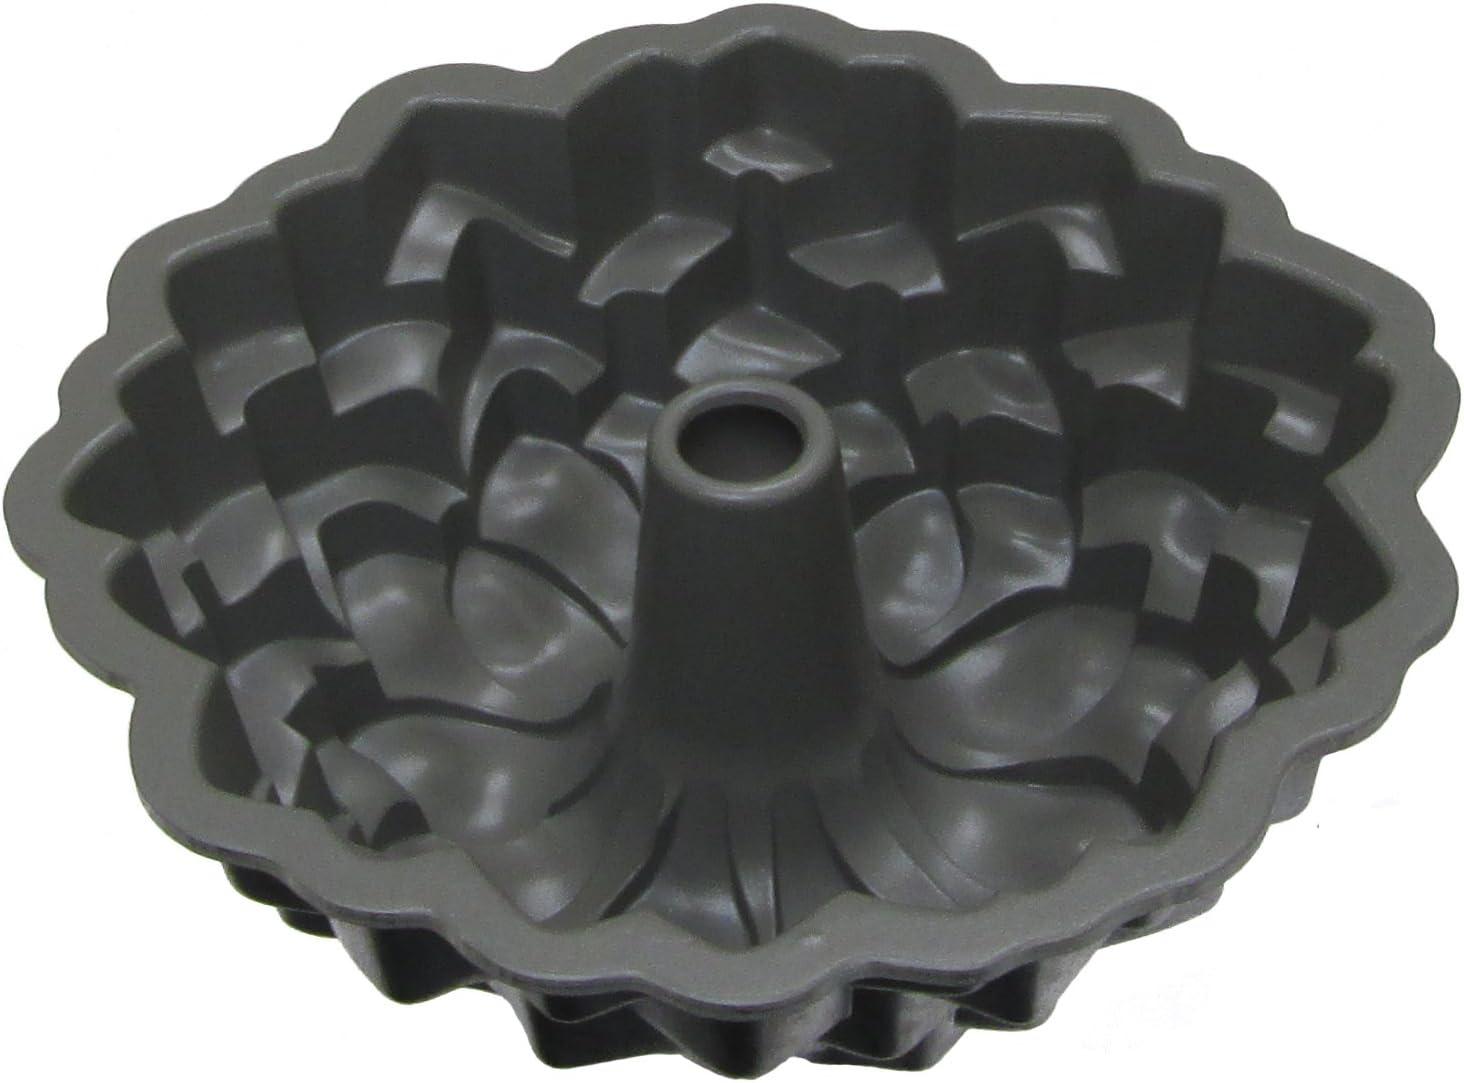 Nordicware Commercial Blossom Bundt Pan